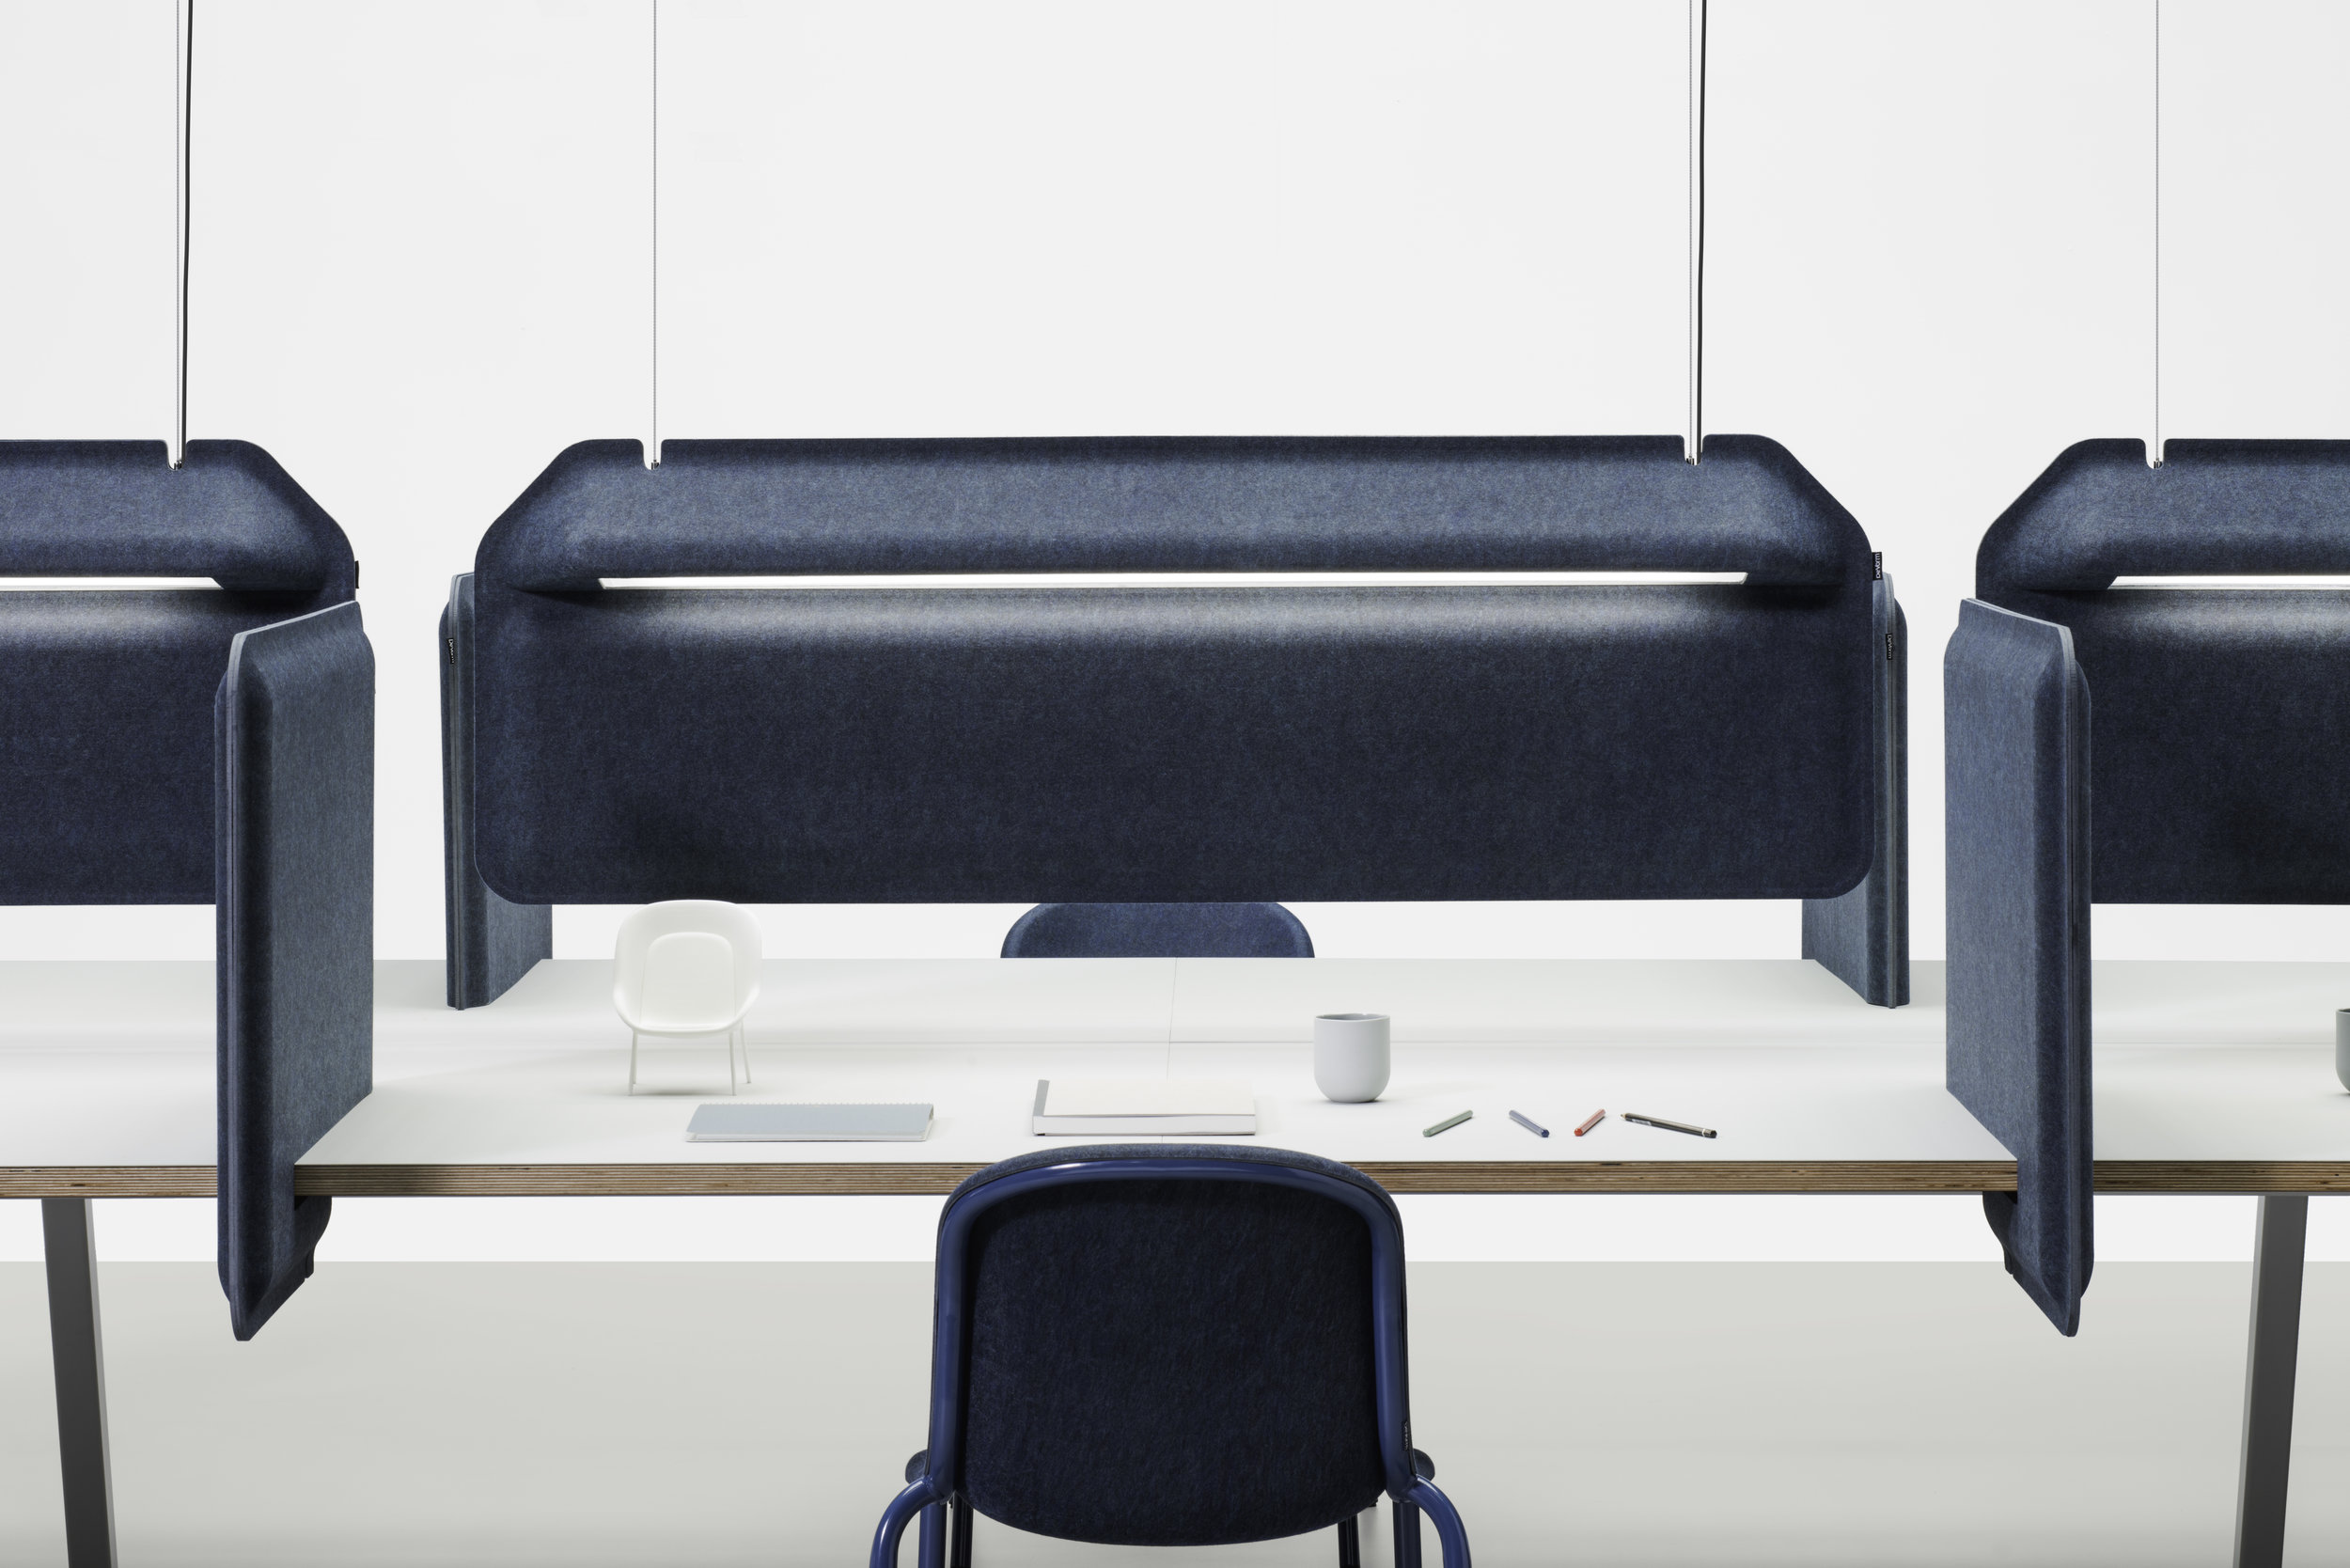 Modular Table System by DeVorm